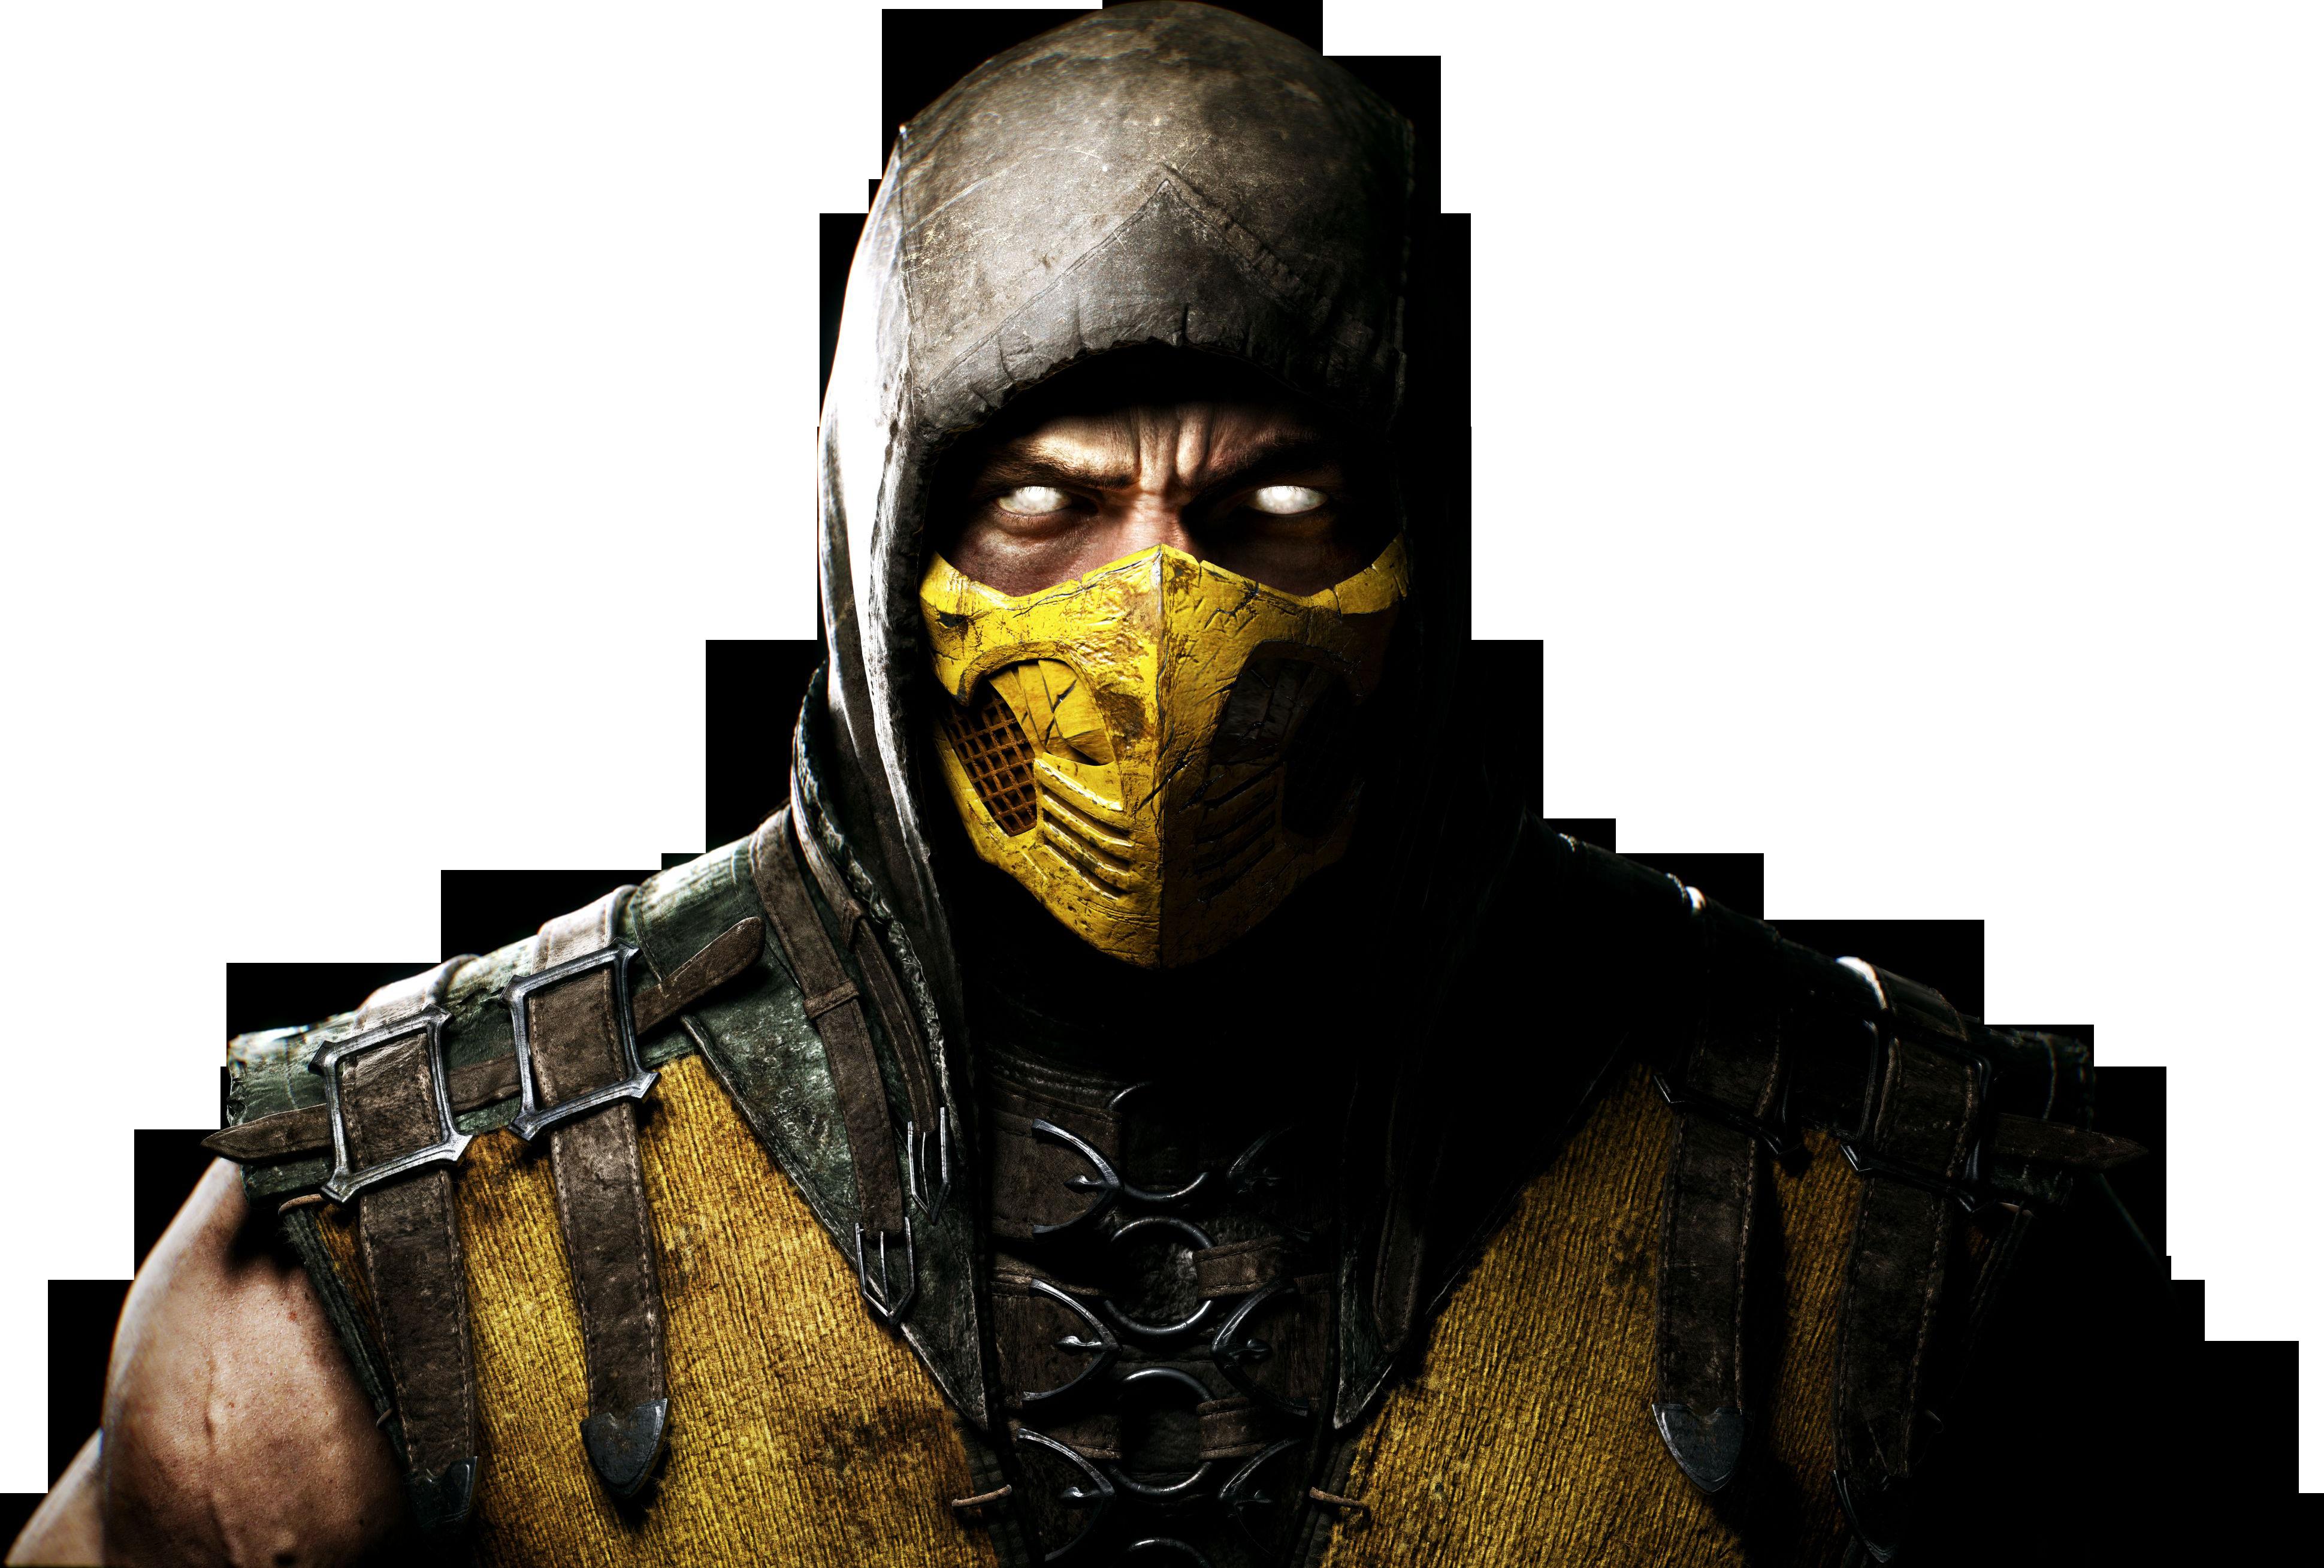 Categorycharacters Mortal Kombat Wiki Mortal Kombat X Scorpion Png Transparent Png Mortal Kombat X Scorpion Mortal Kombat Mortal Kombat X